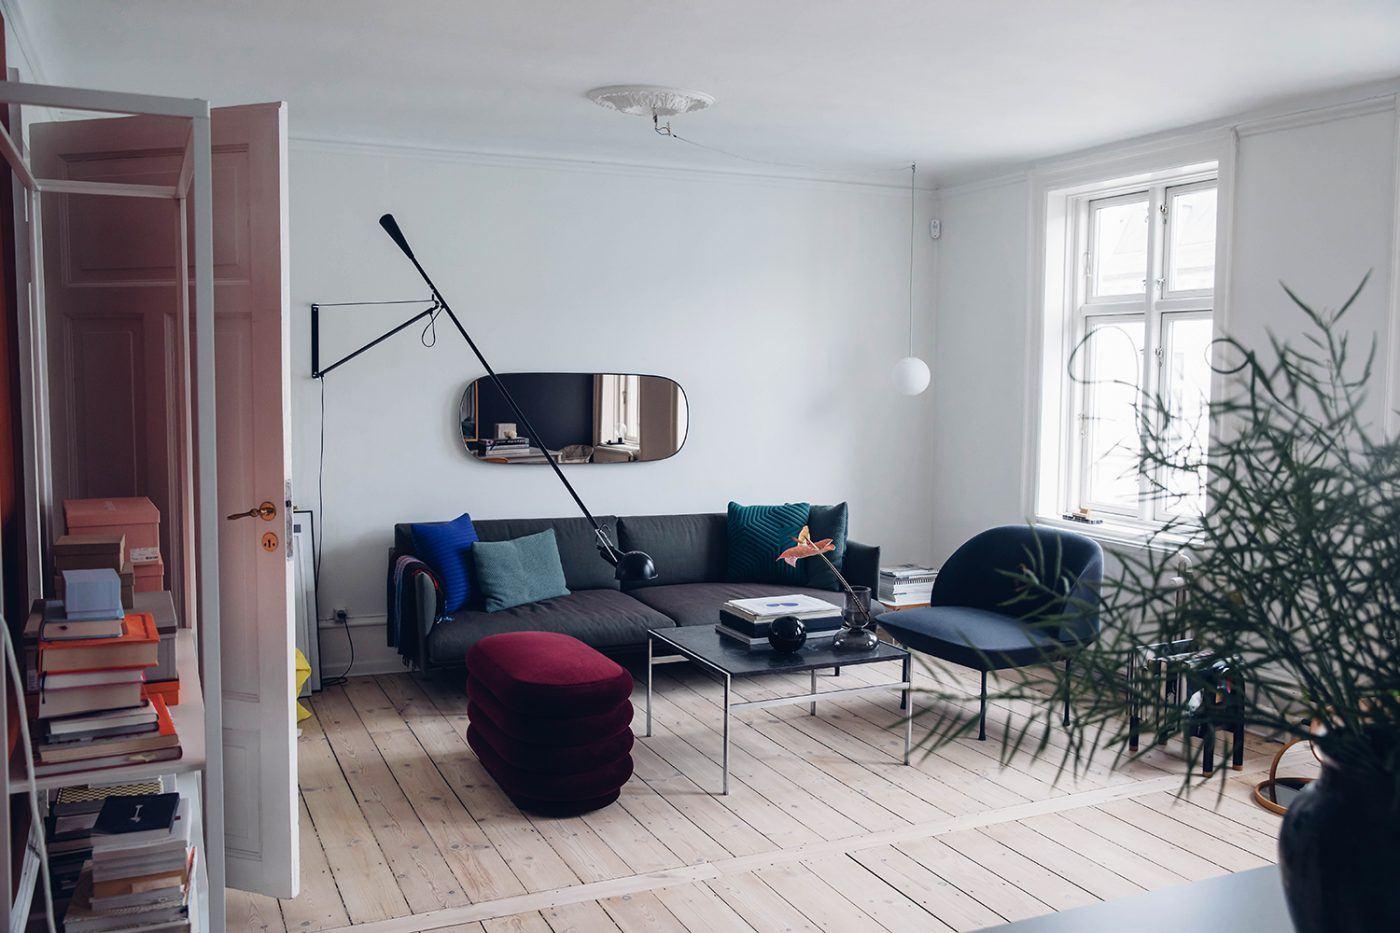 Image for Home Tour with Nina Bruun in Copenhagen